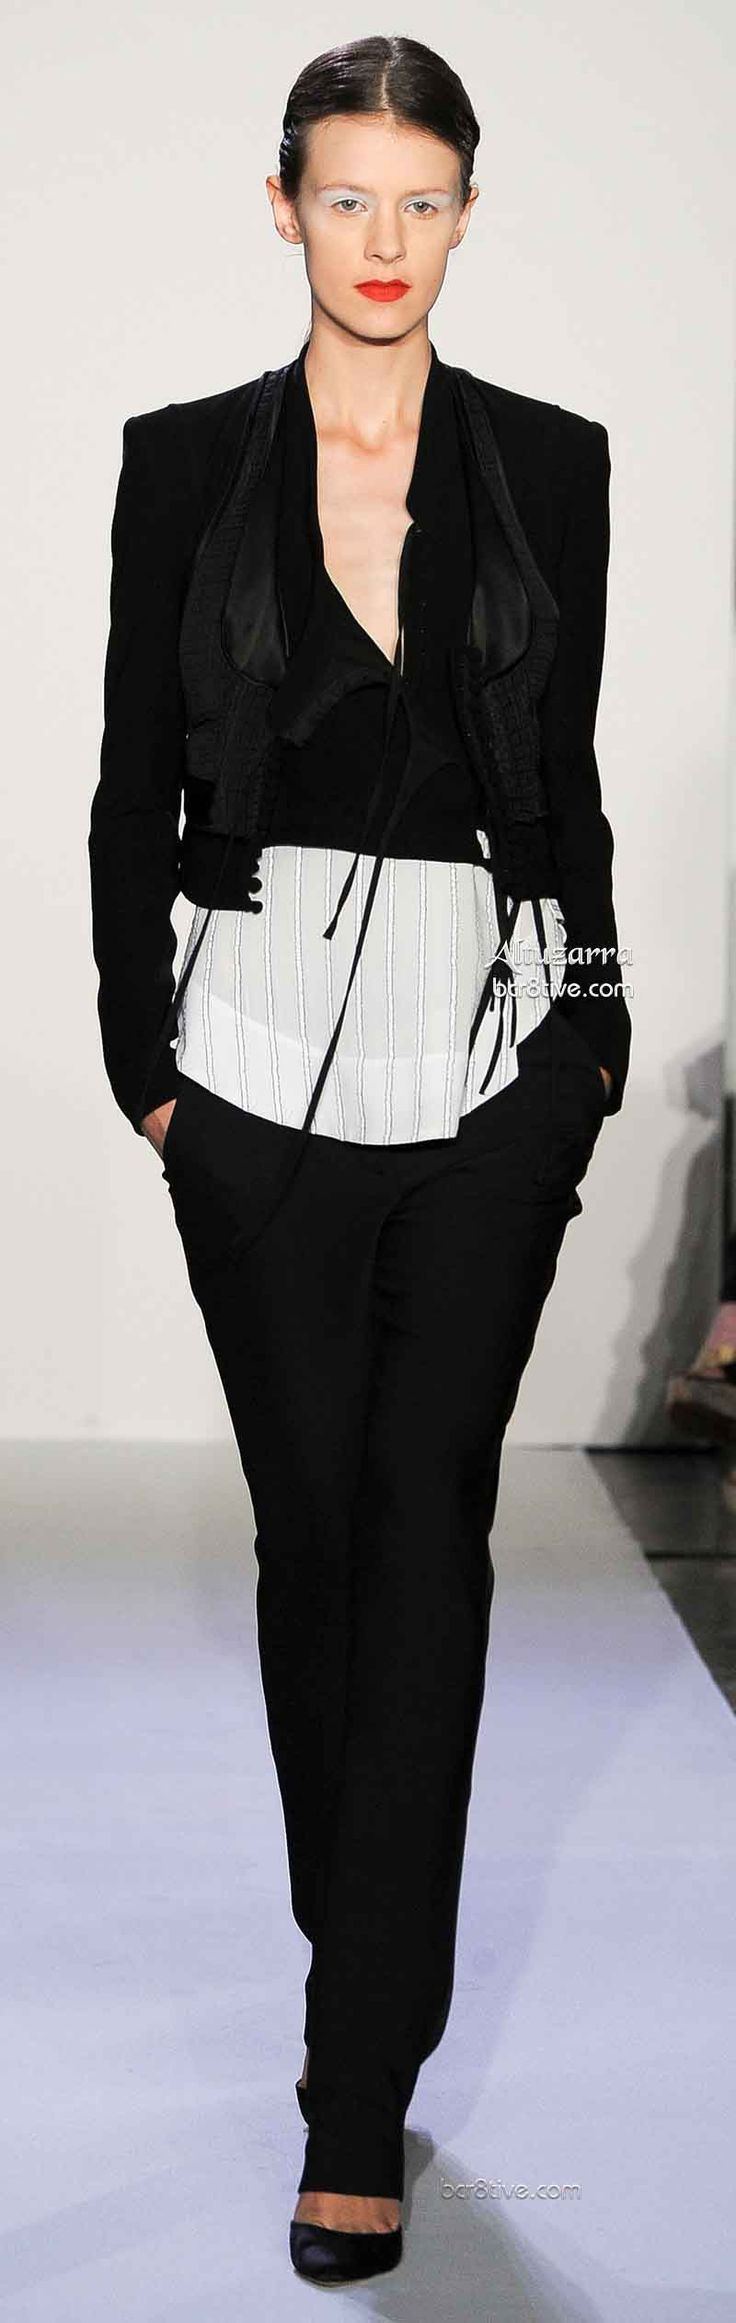 Altuzarra Short Black Jacket, Long Blouse, Skinny Dress Pants